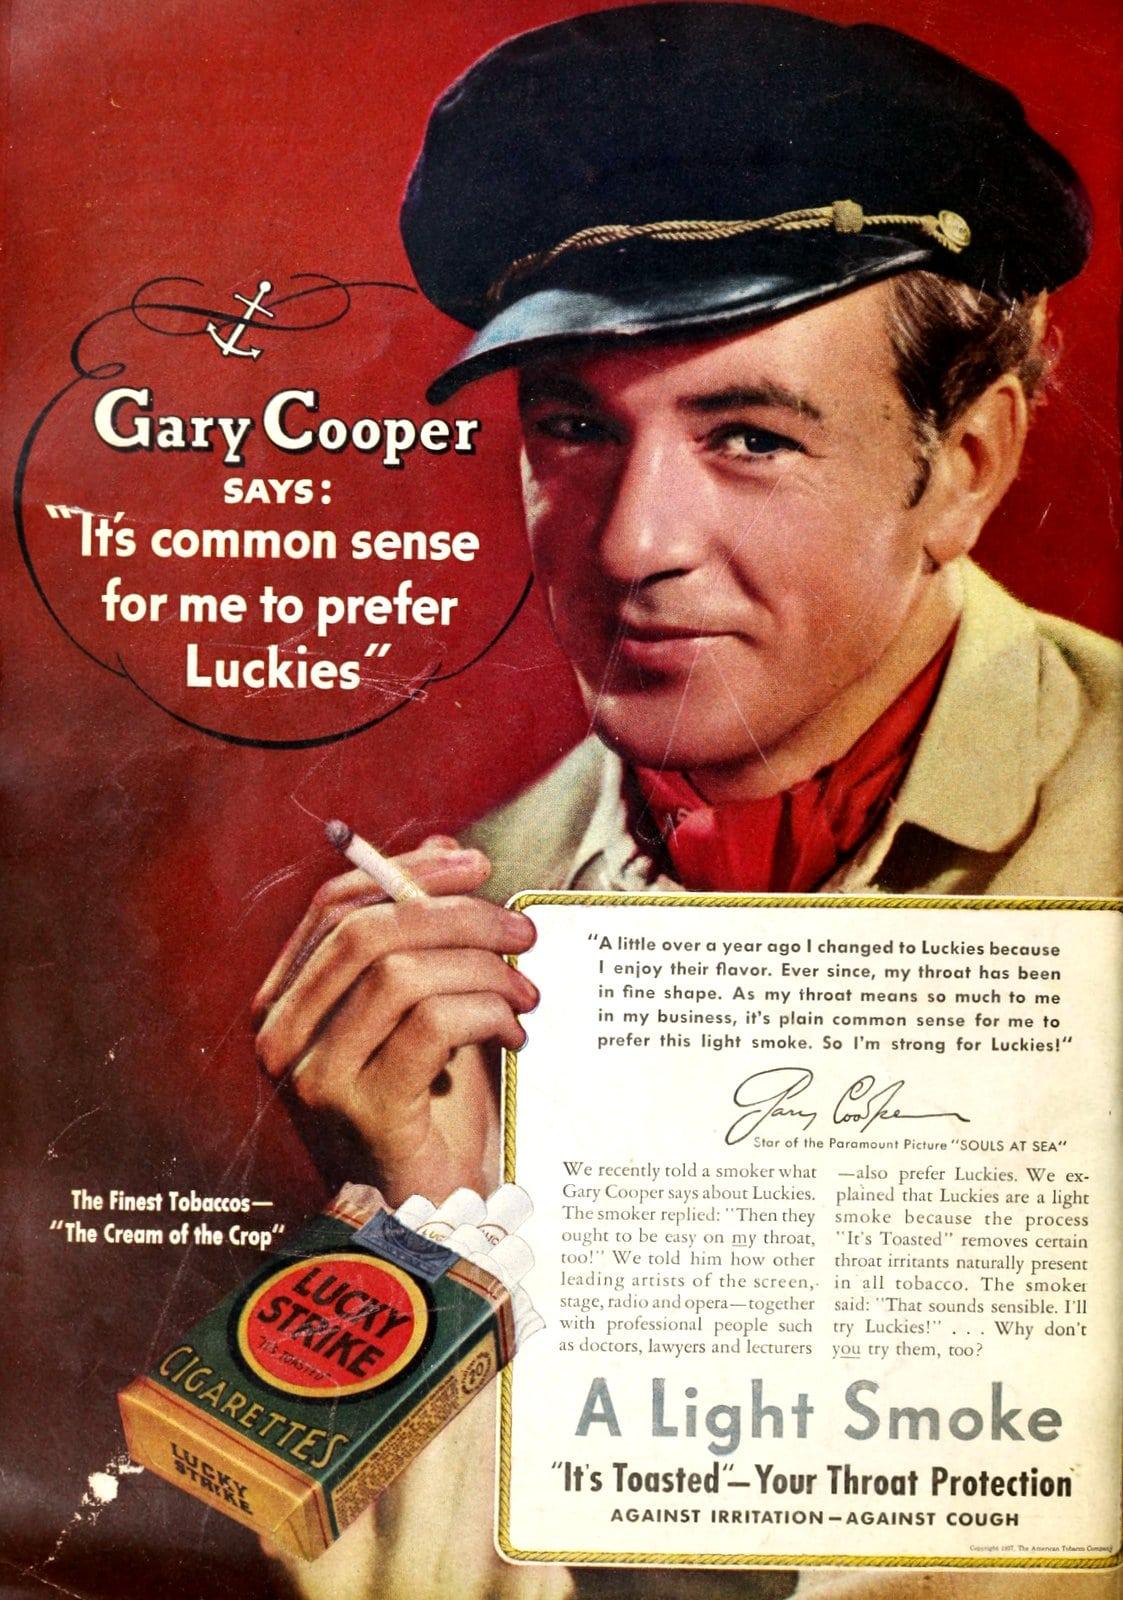 Gary Cooper for Lucky Strike cigarettes (1930s)